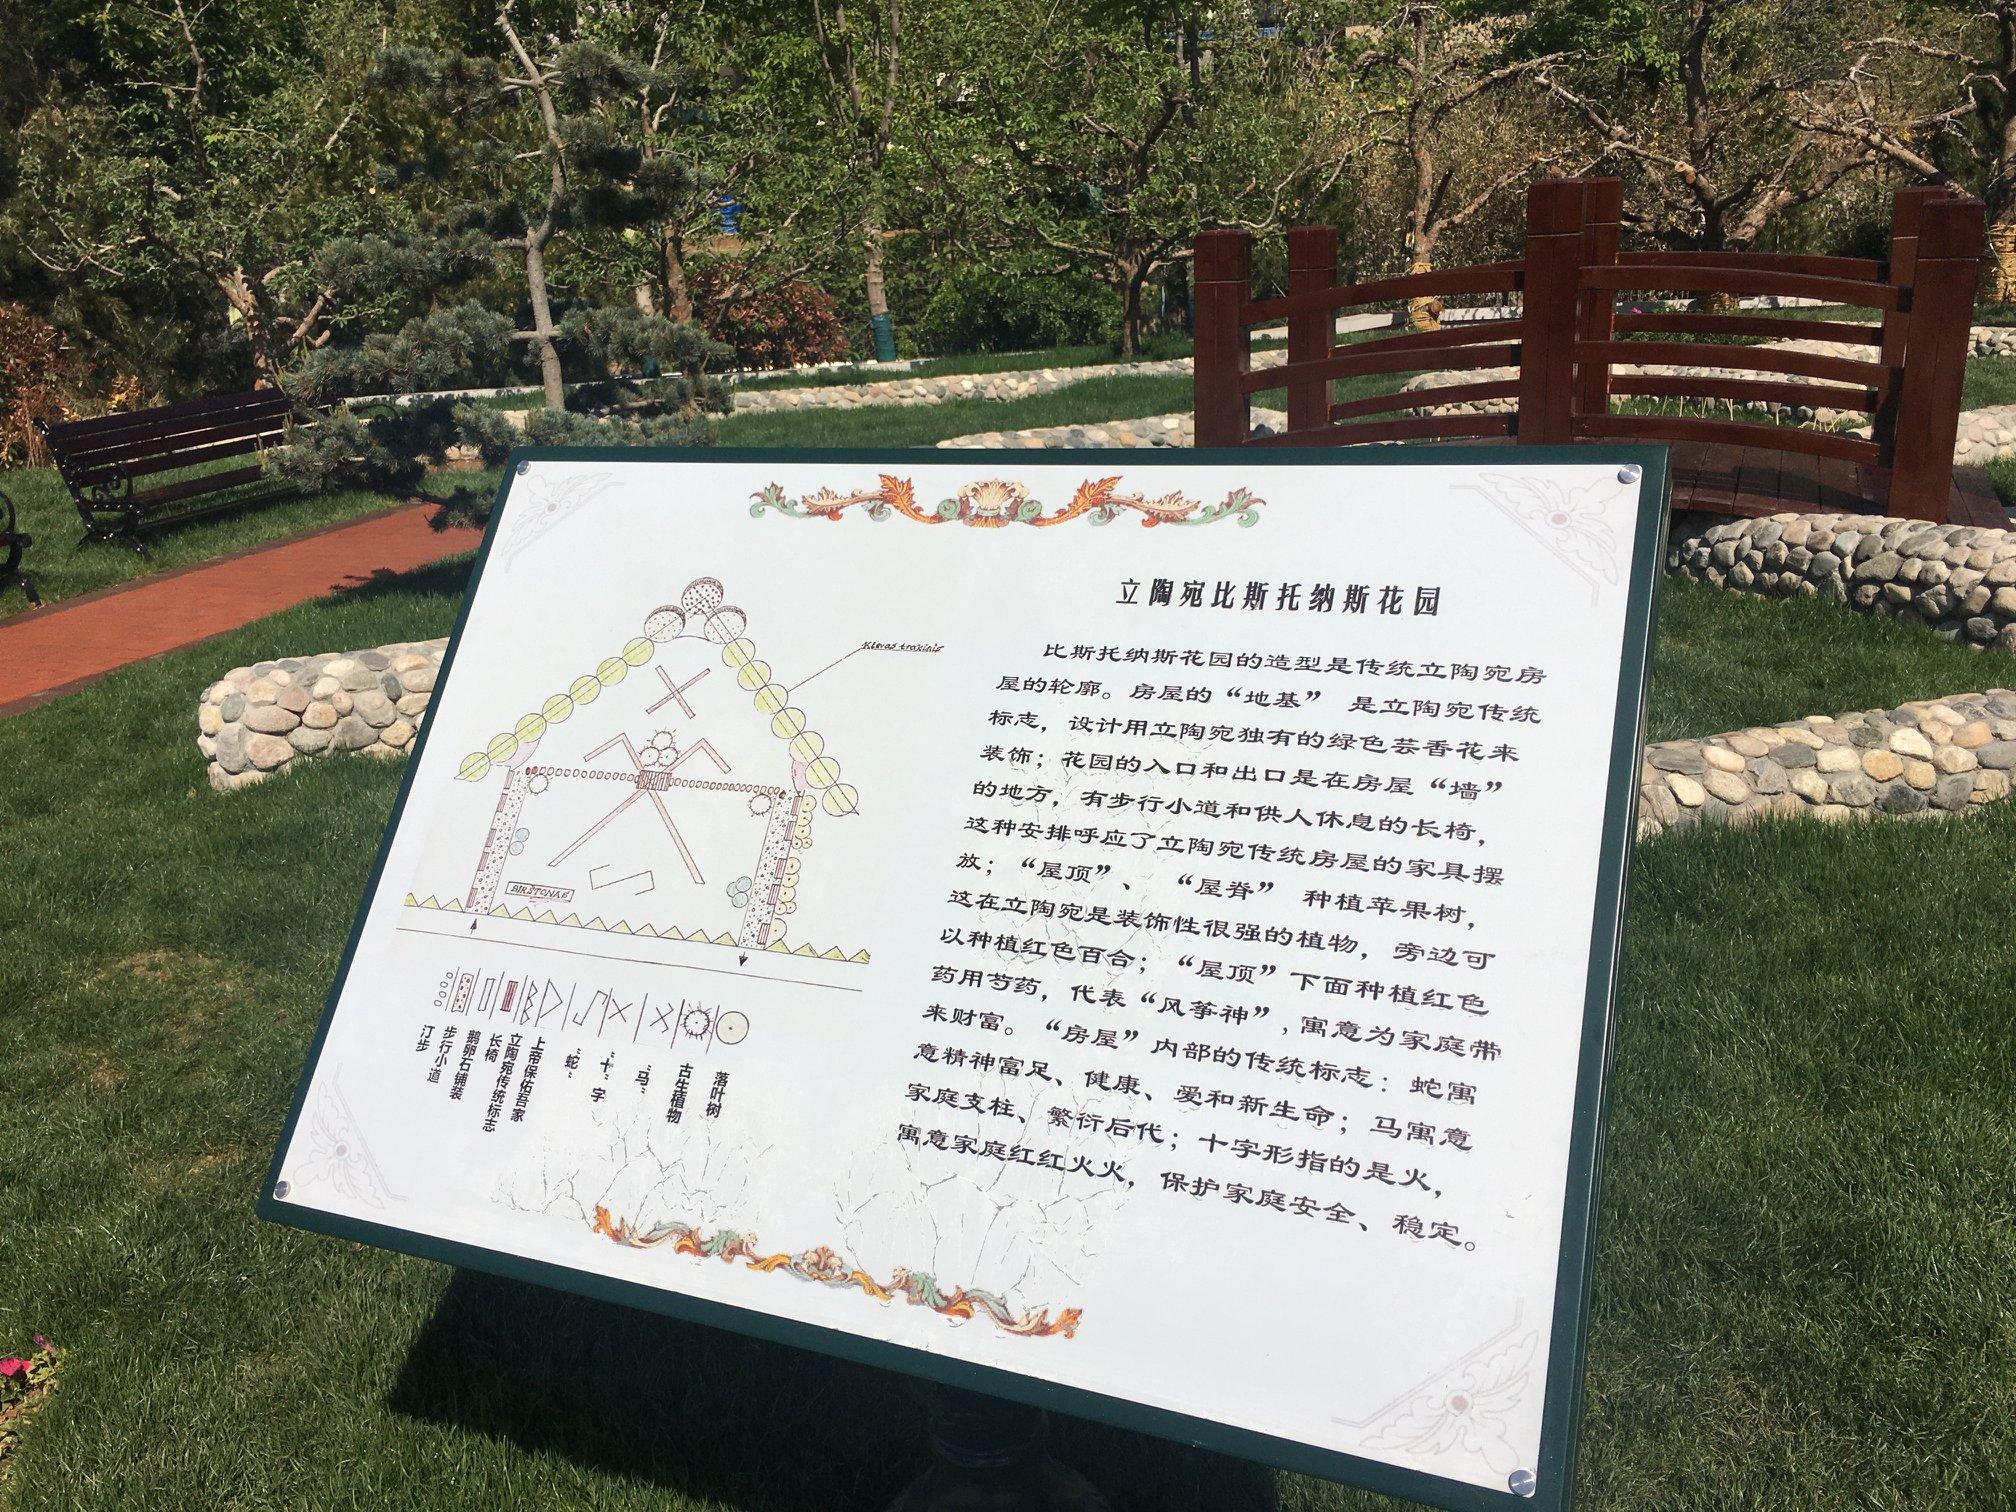 Lietuviškas skveras Jinane, Kinijoje